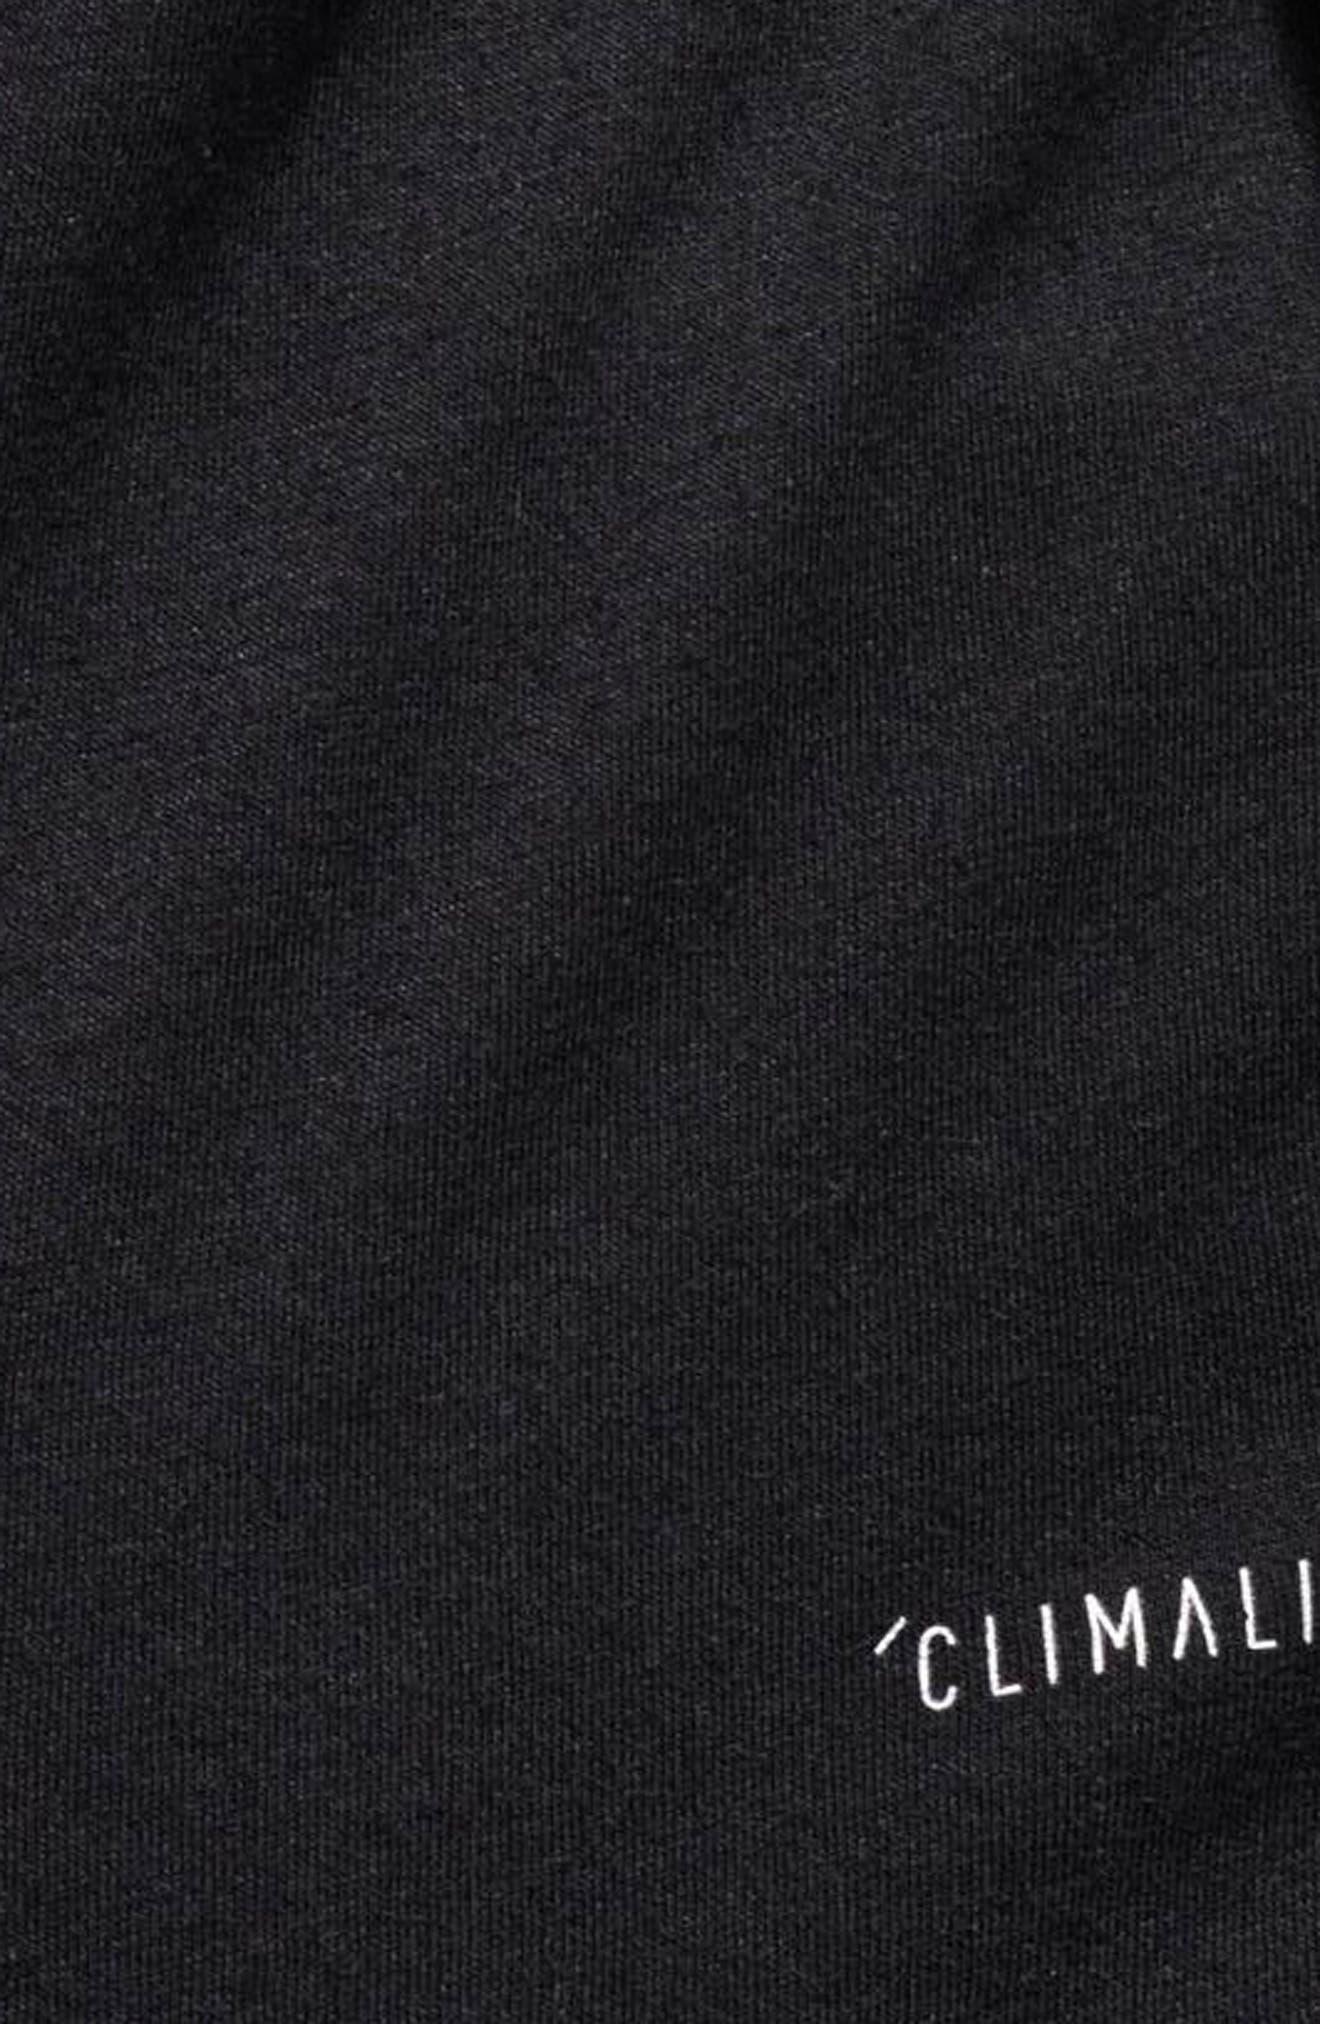 BOS Label T-Shirt,                             Alternate thumbnail 3, color,                             001